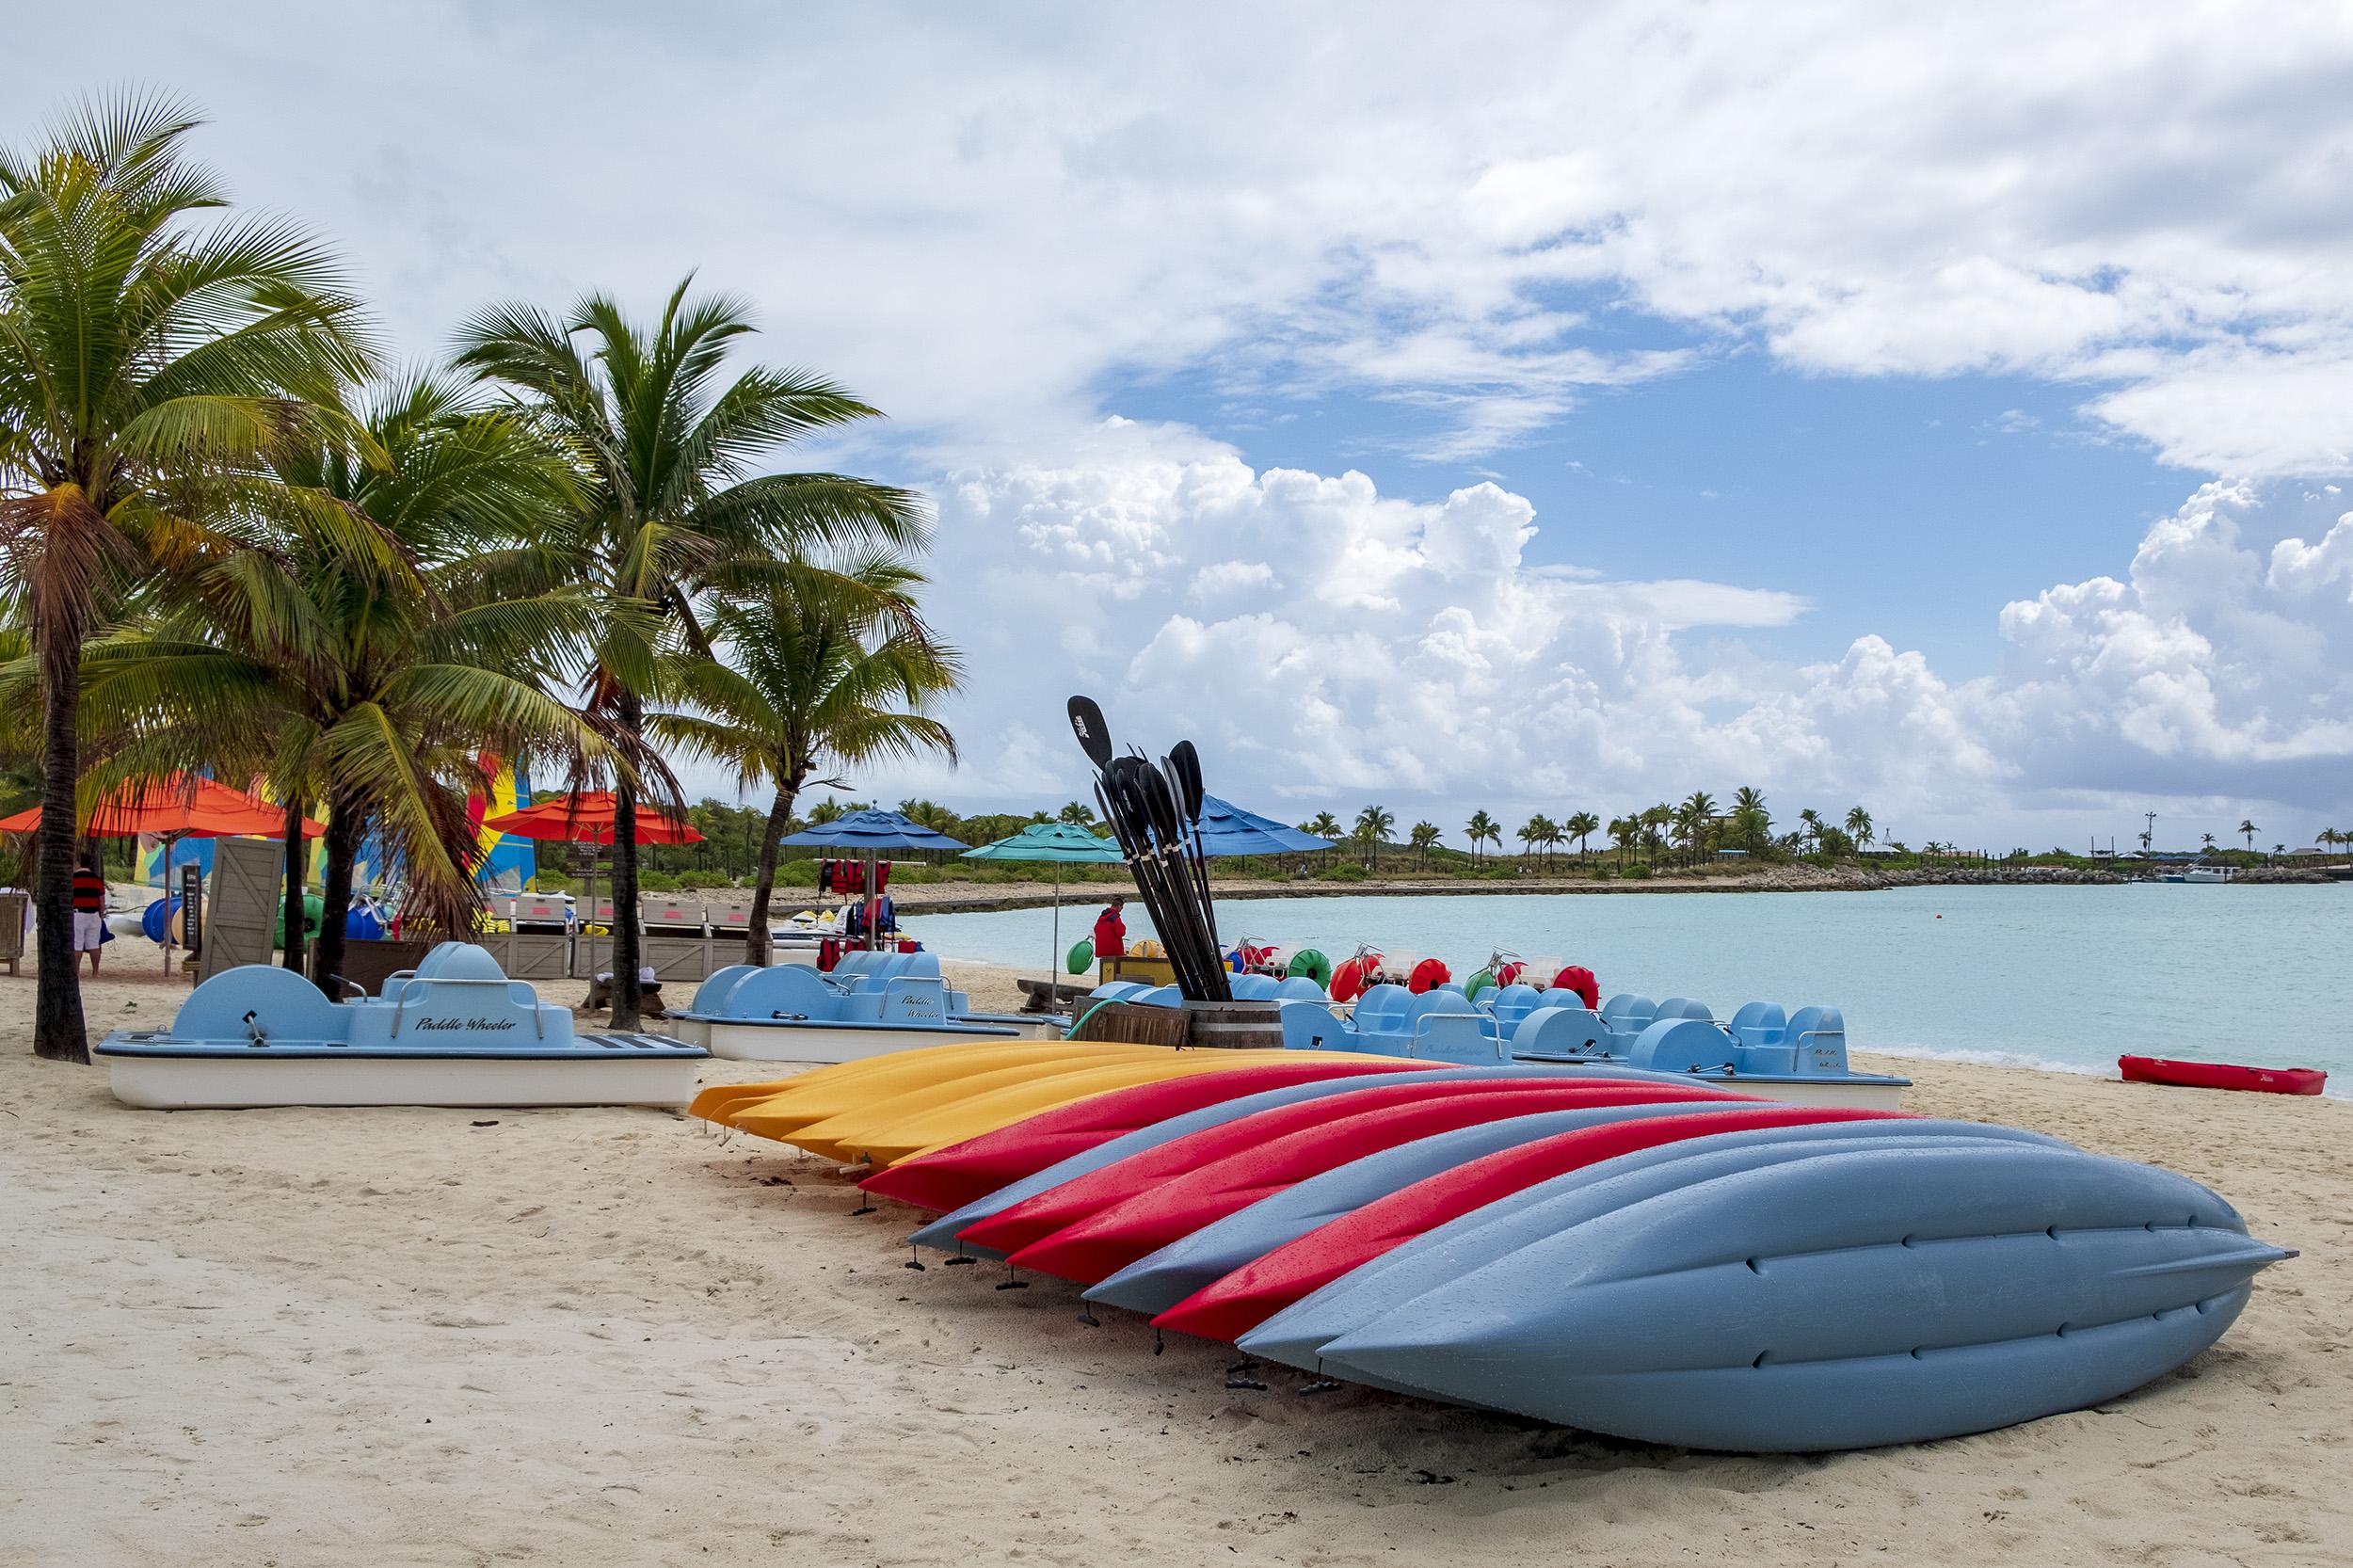 Castaway Cay Kajaker